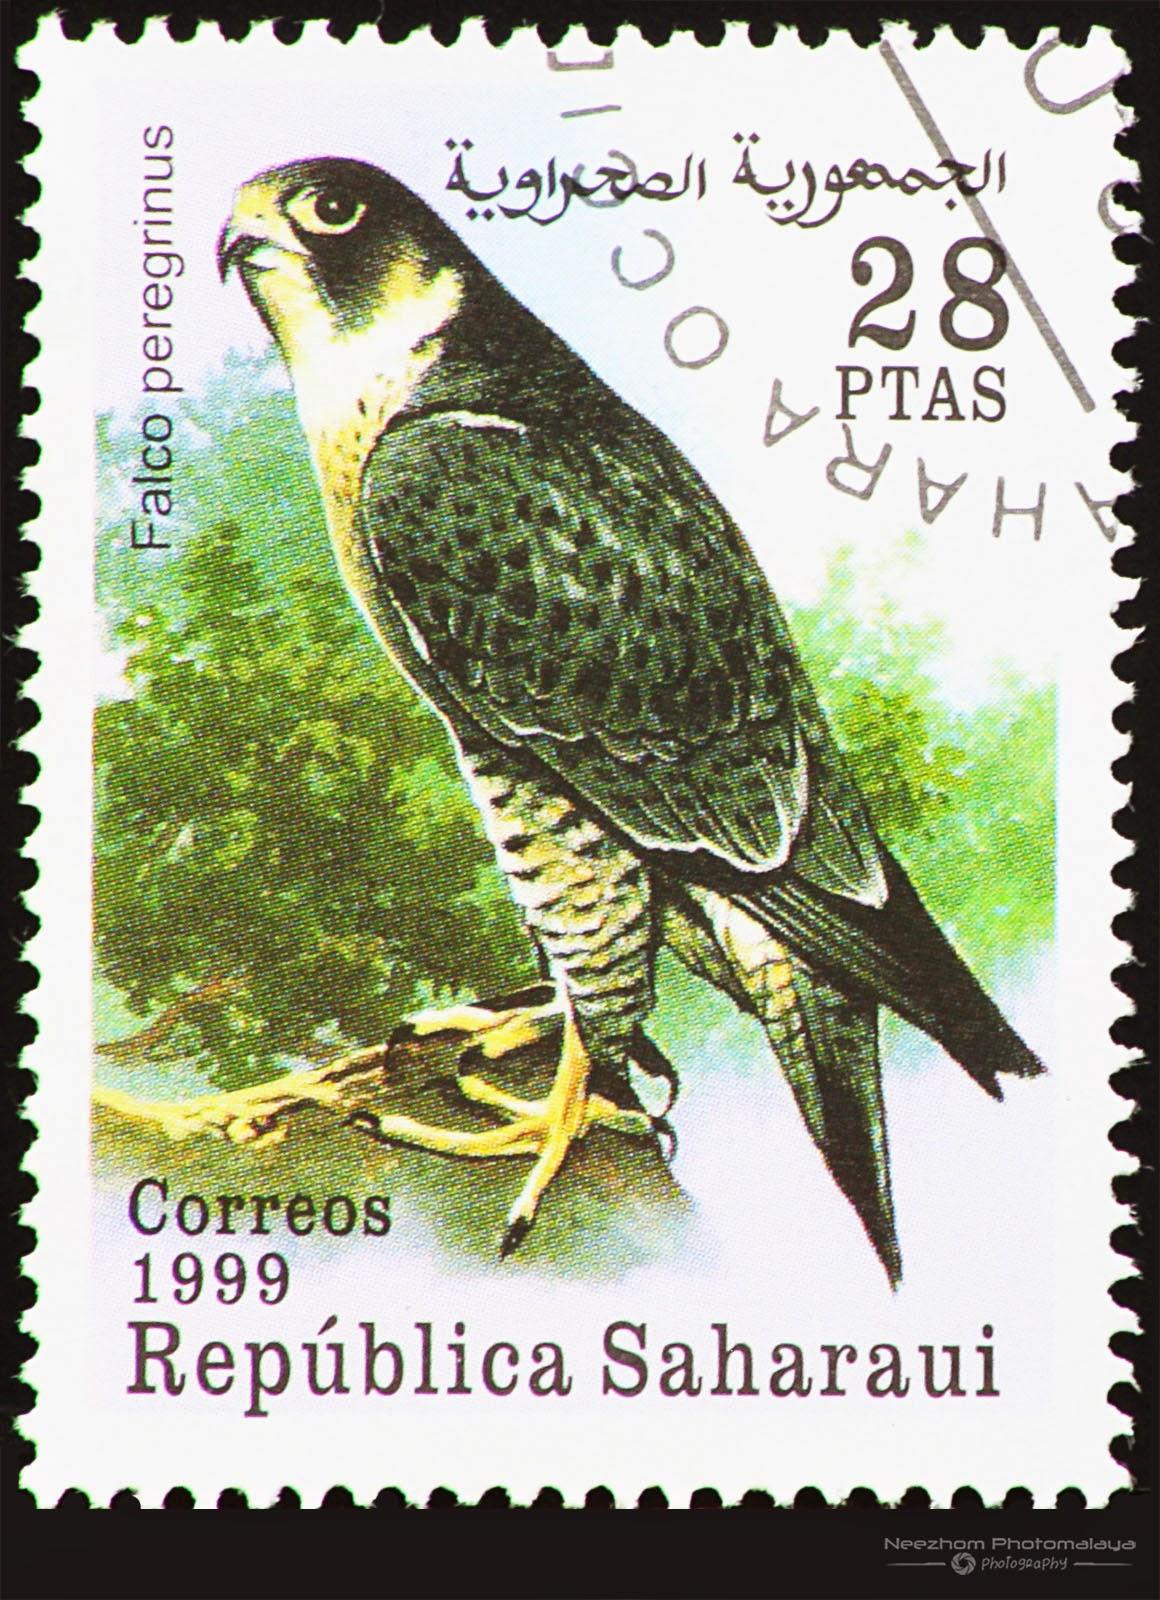 Western Sahara 1999 Birds of Prey stamp - Peregrine Falcon (Falco peregrinus) 28 ptas